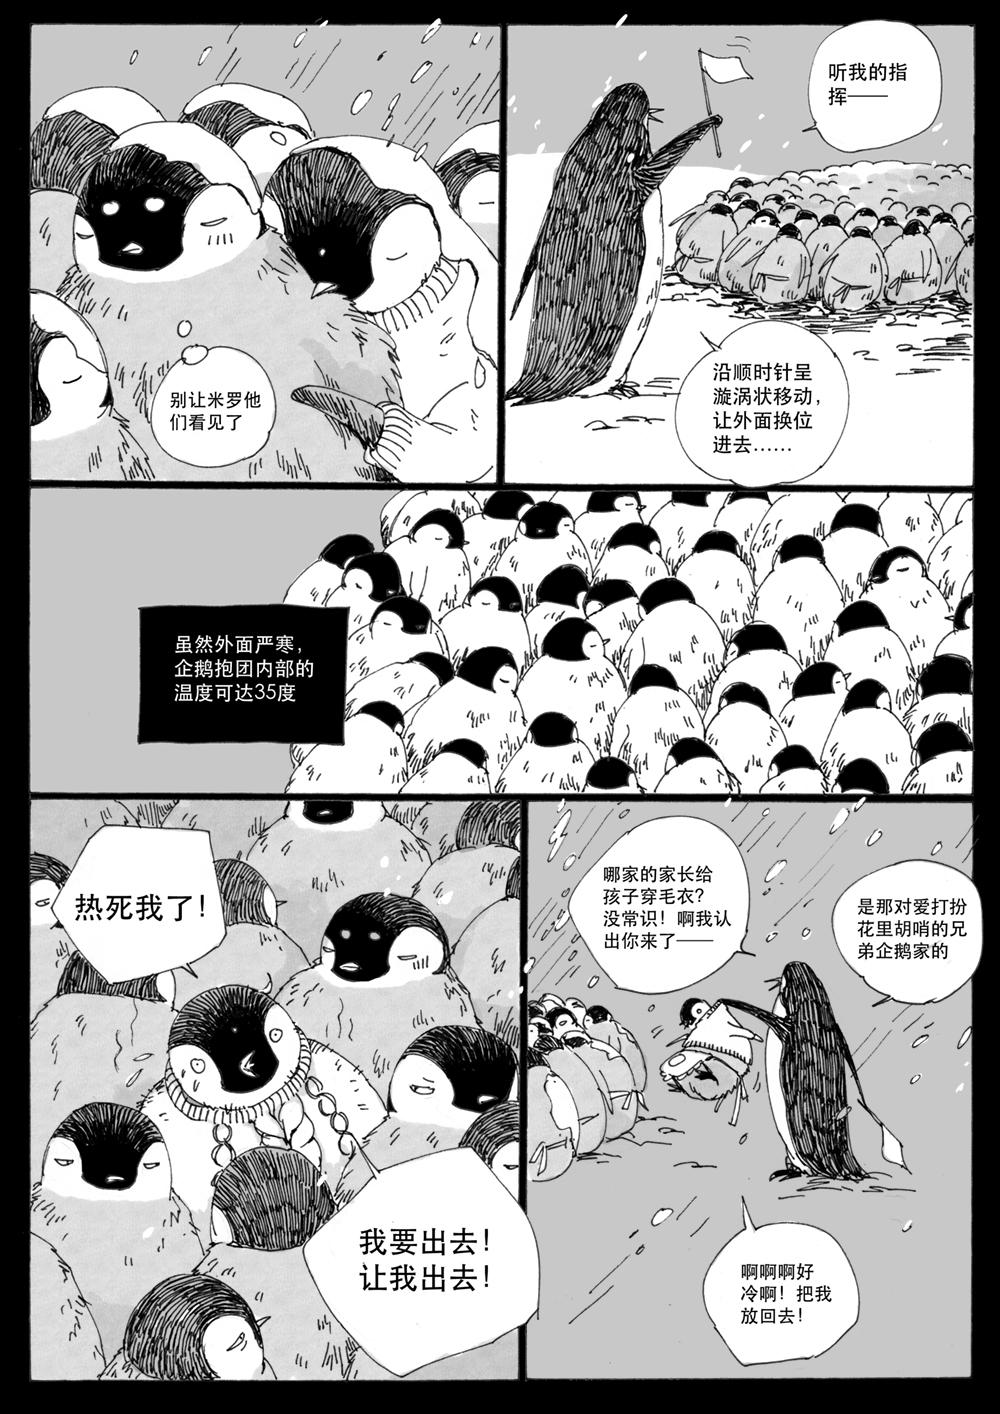 penguin31_1000